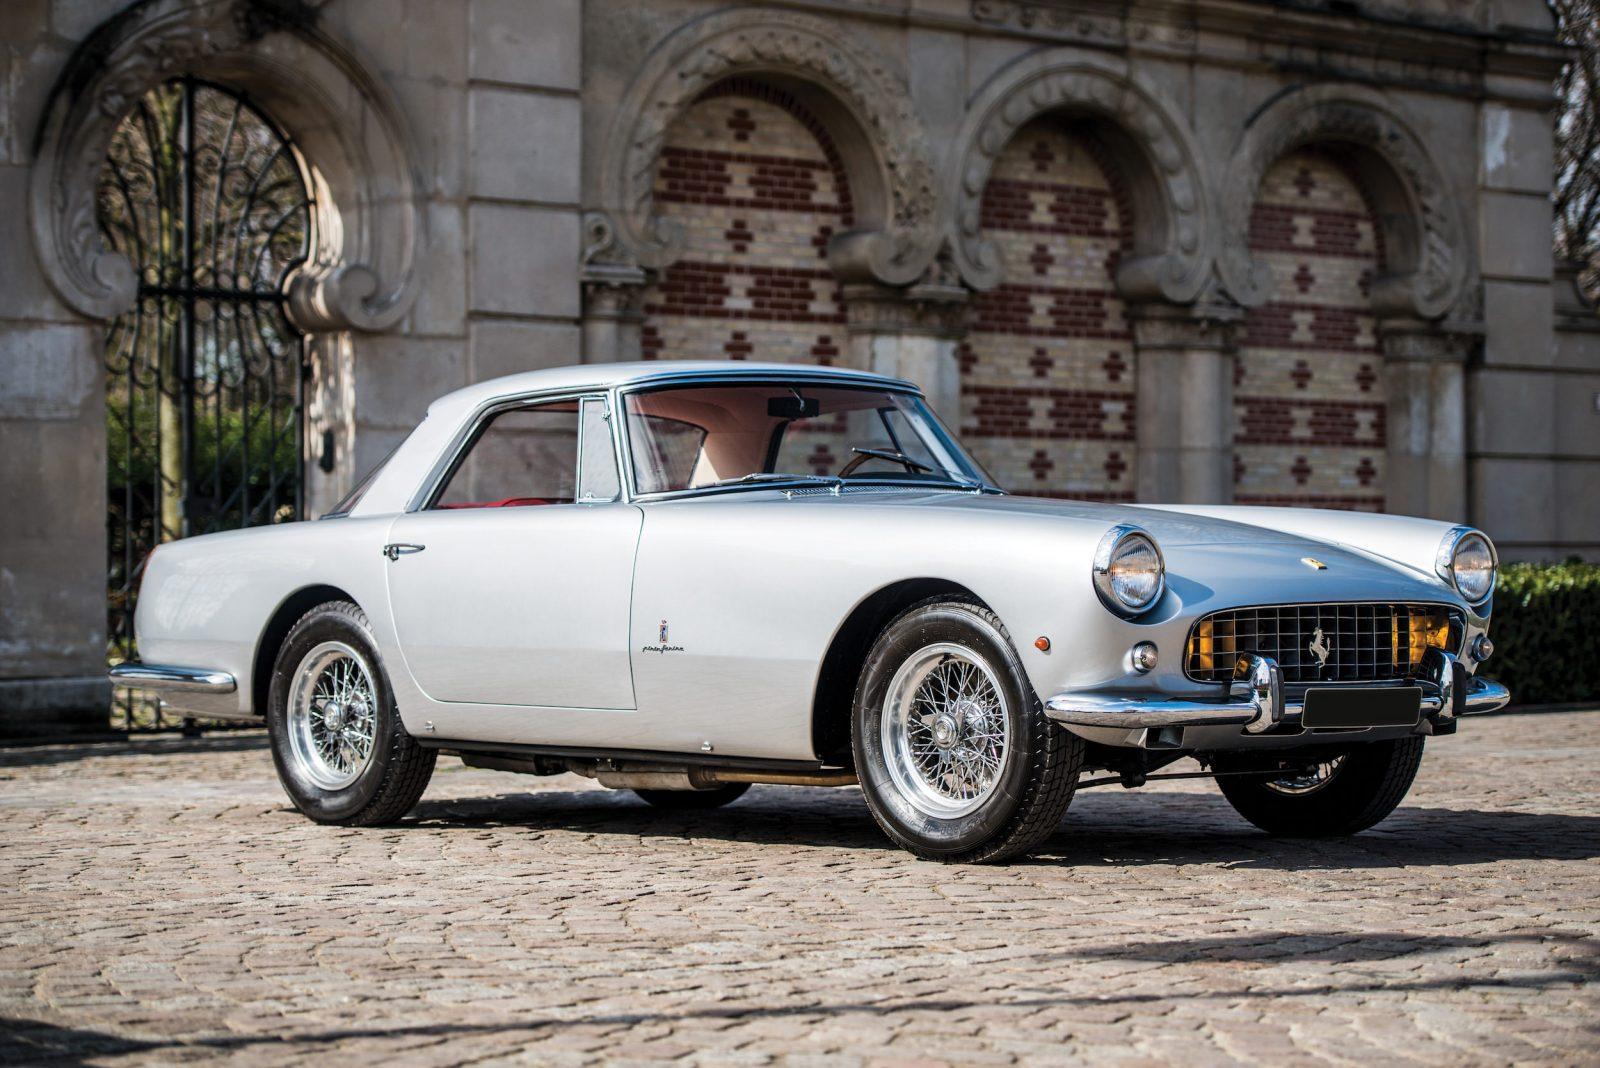 Ferrari 250 GT 1600x1068 - 1960 Ferrari 250 GT Coupe Pinin Farina Series II